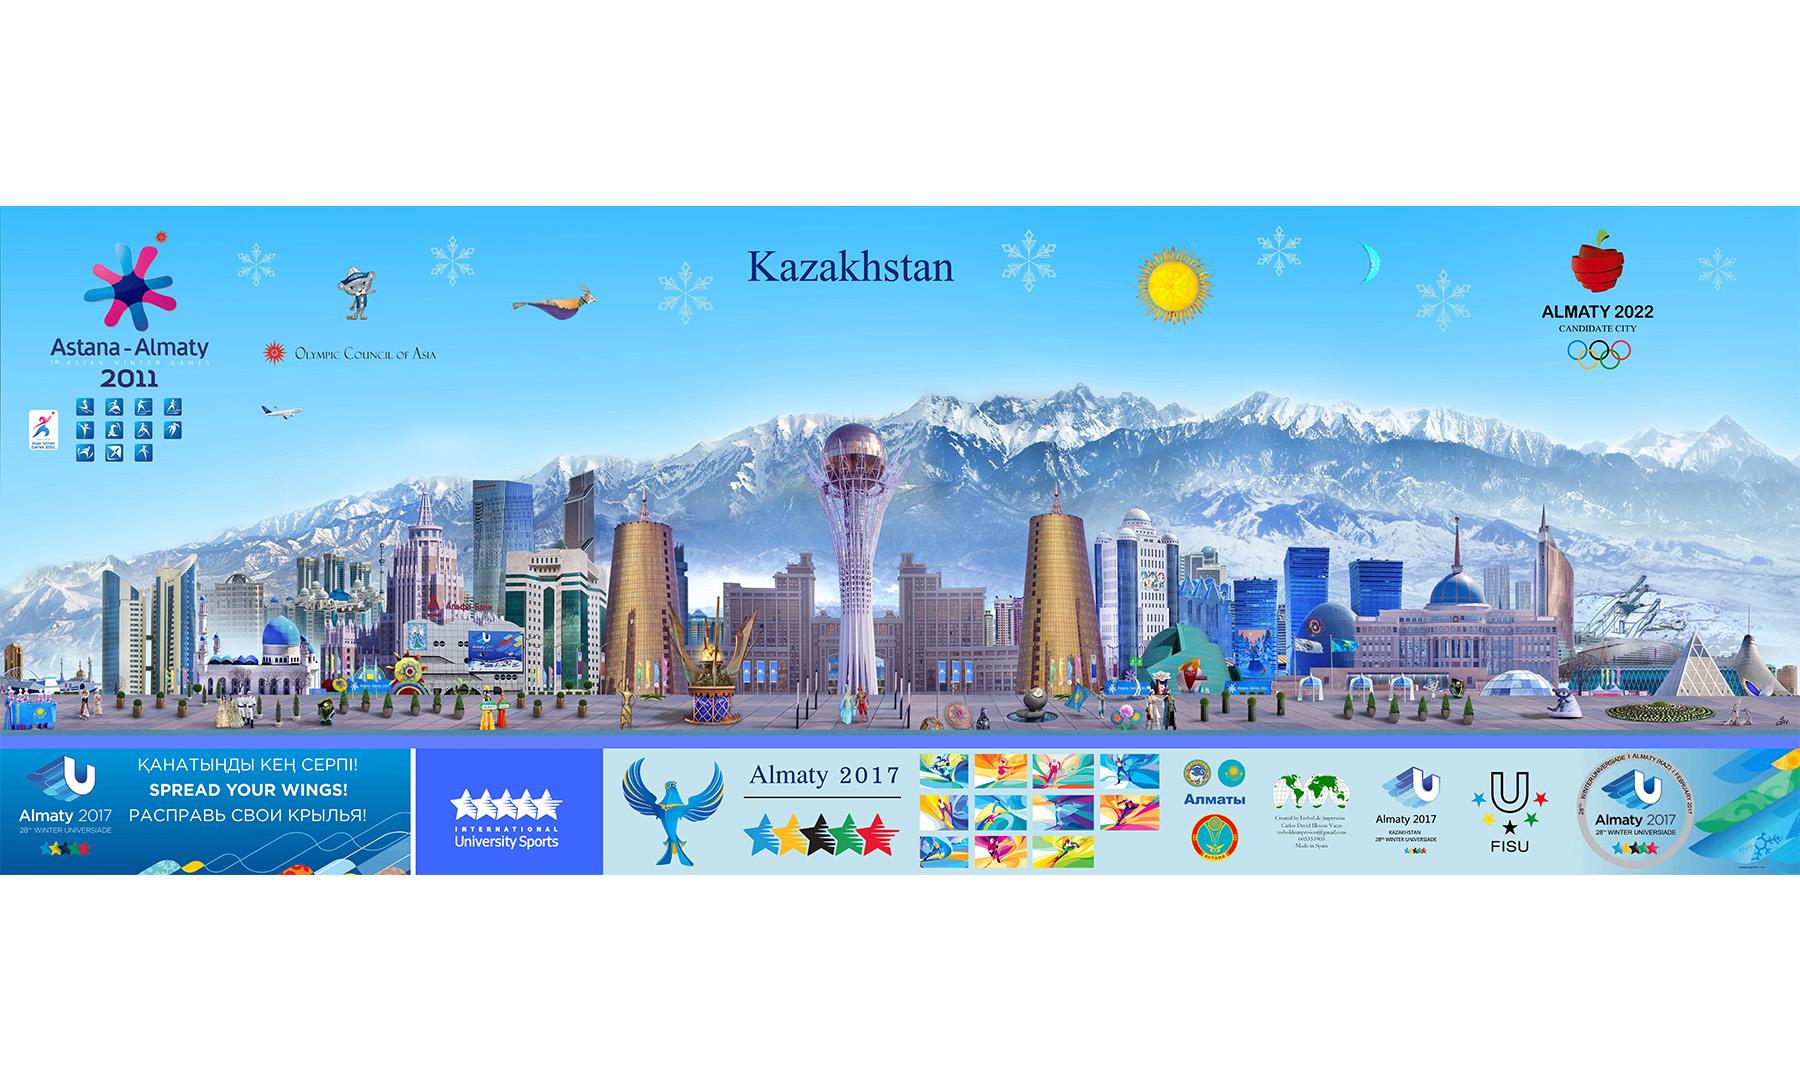 Carlos_David_Illecas_0000_P+›ster Almaty JPG